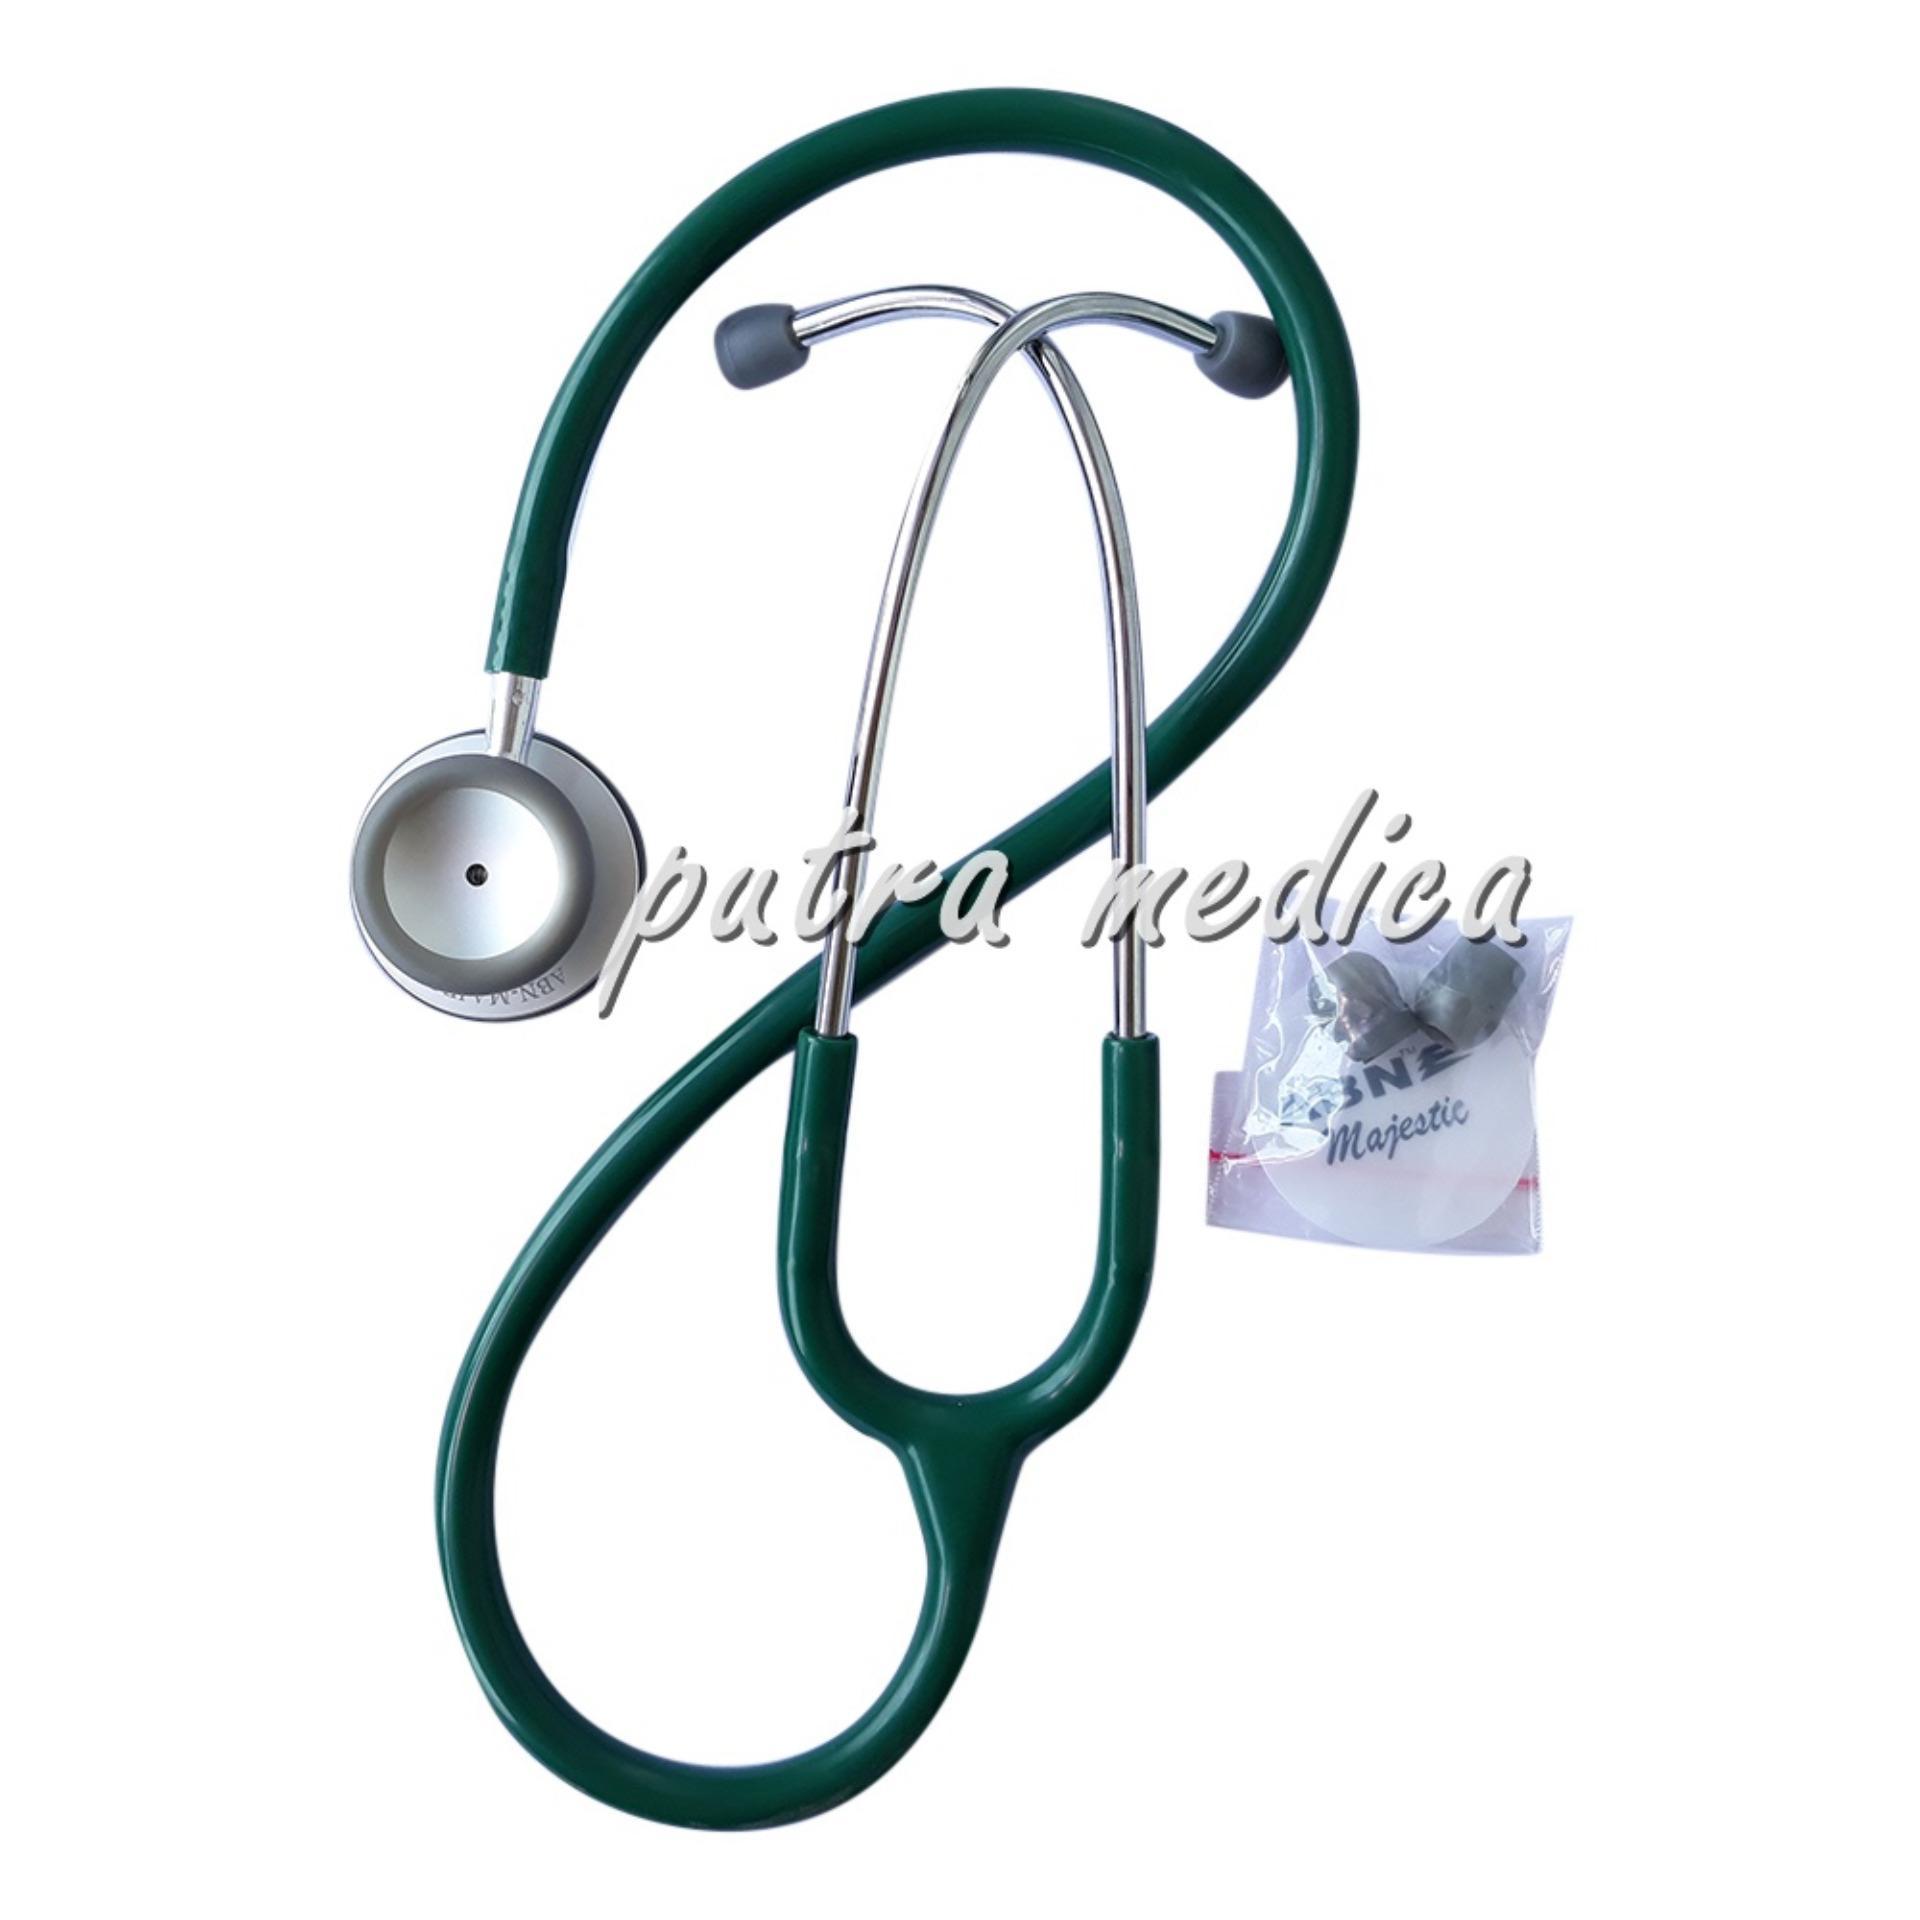 Putra Medica Abn Stetoskop Majestic Hunter Green Alat Kedokteran Putra Medica Diskon